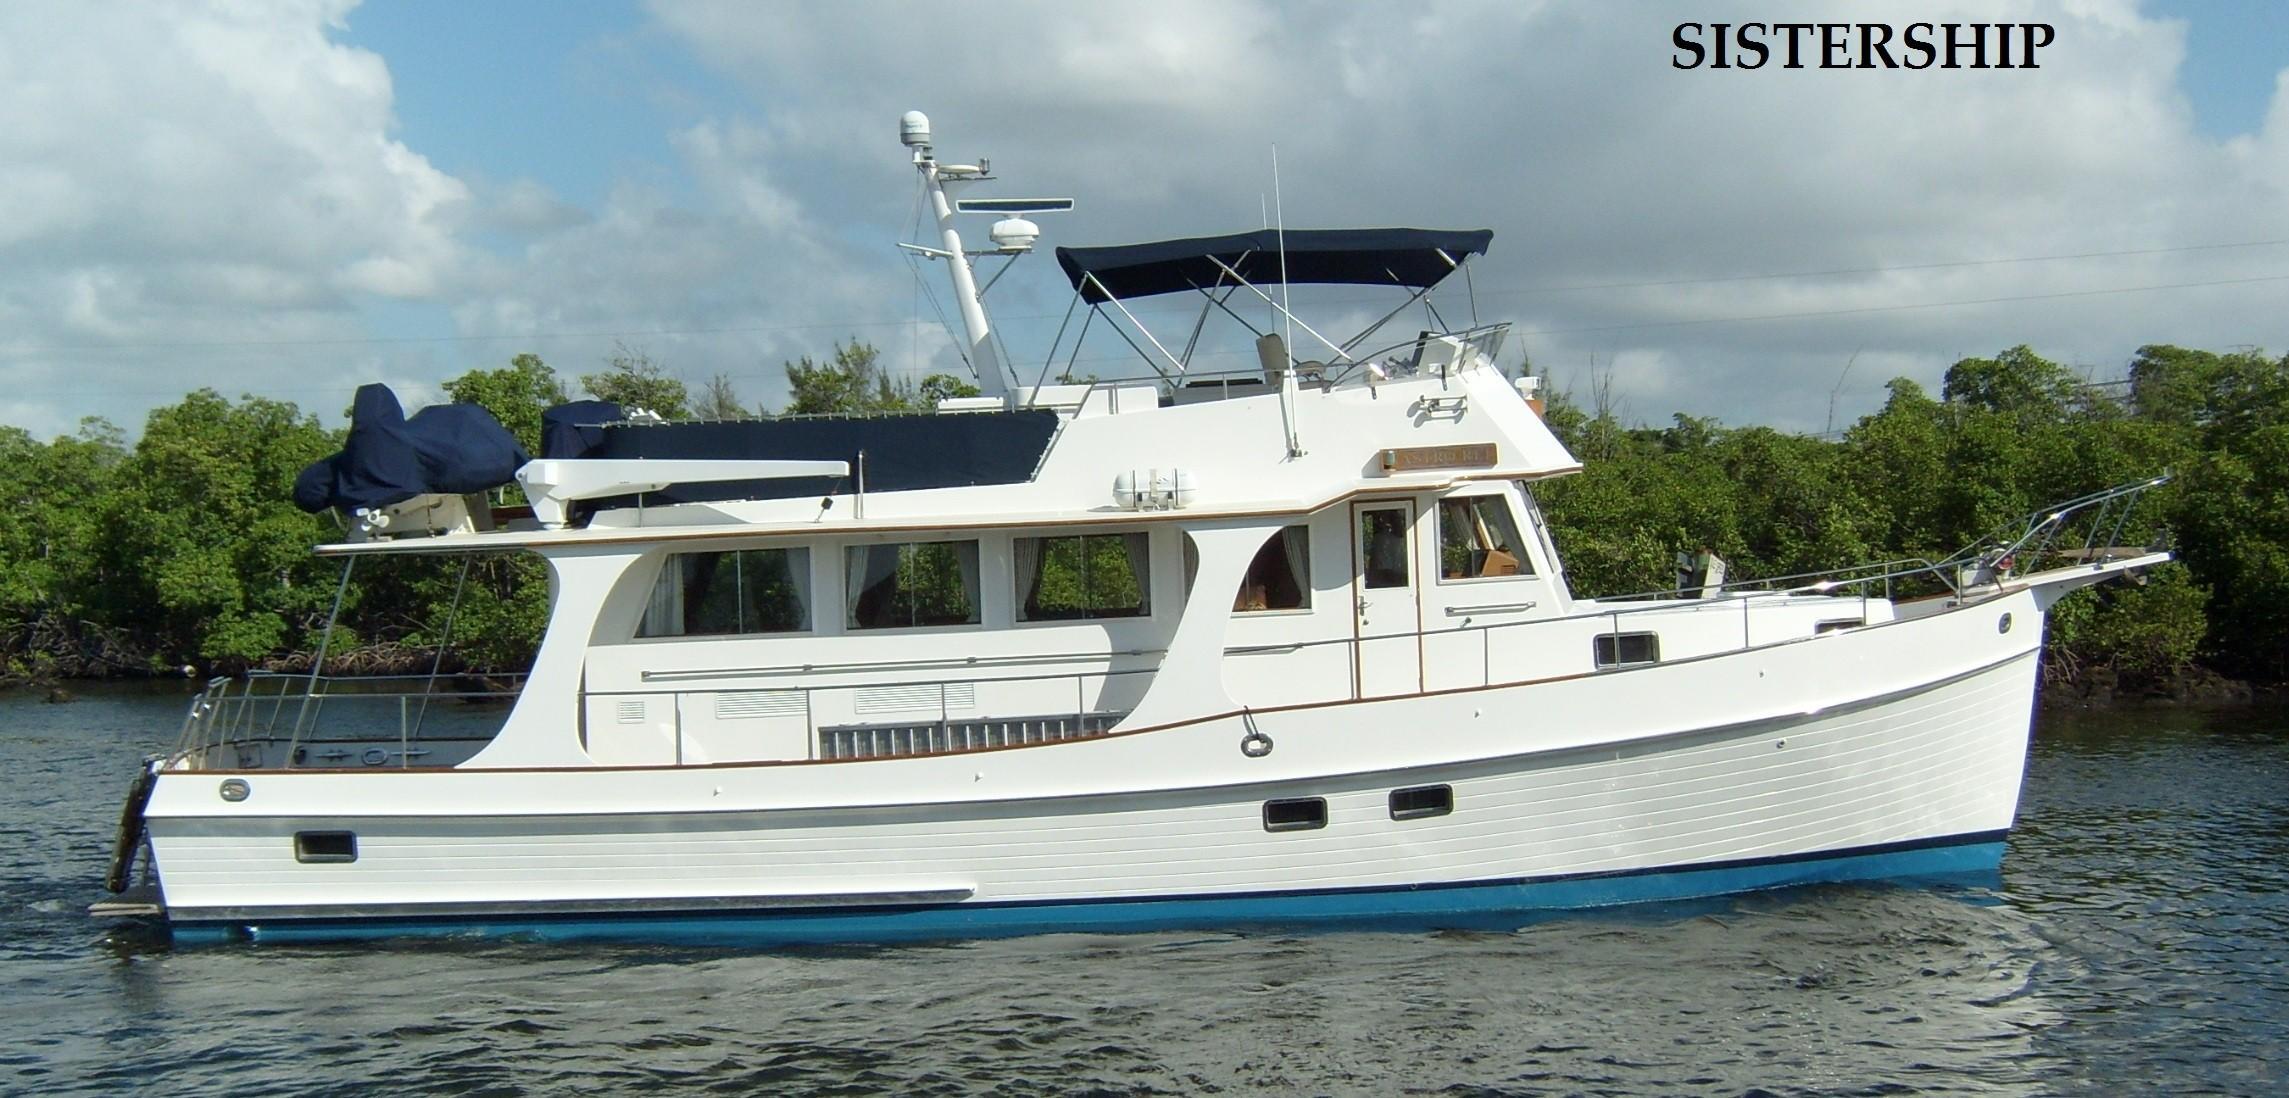 Grand Banks Yachts | Cruising, Skylounge, East Bay and